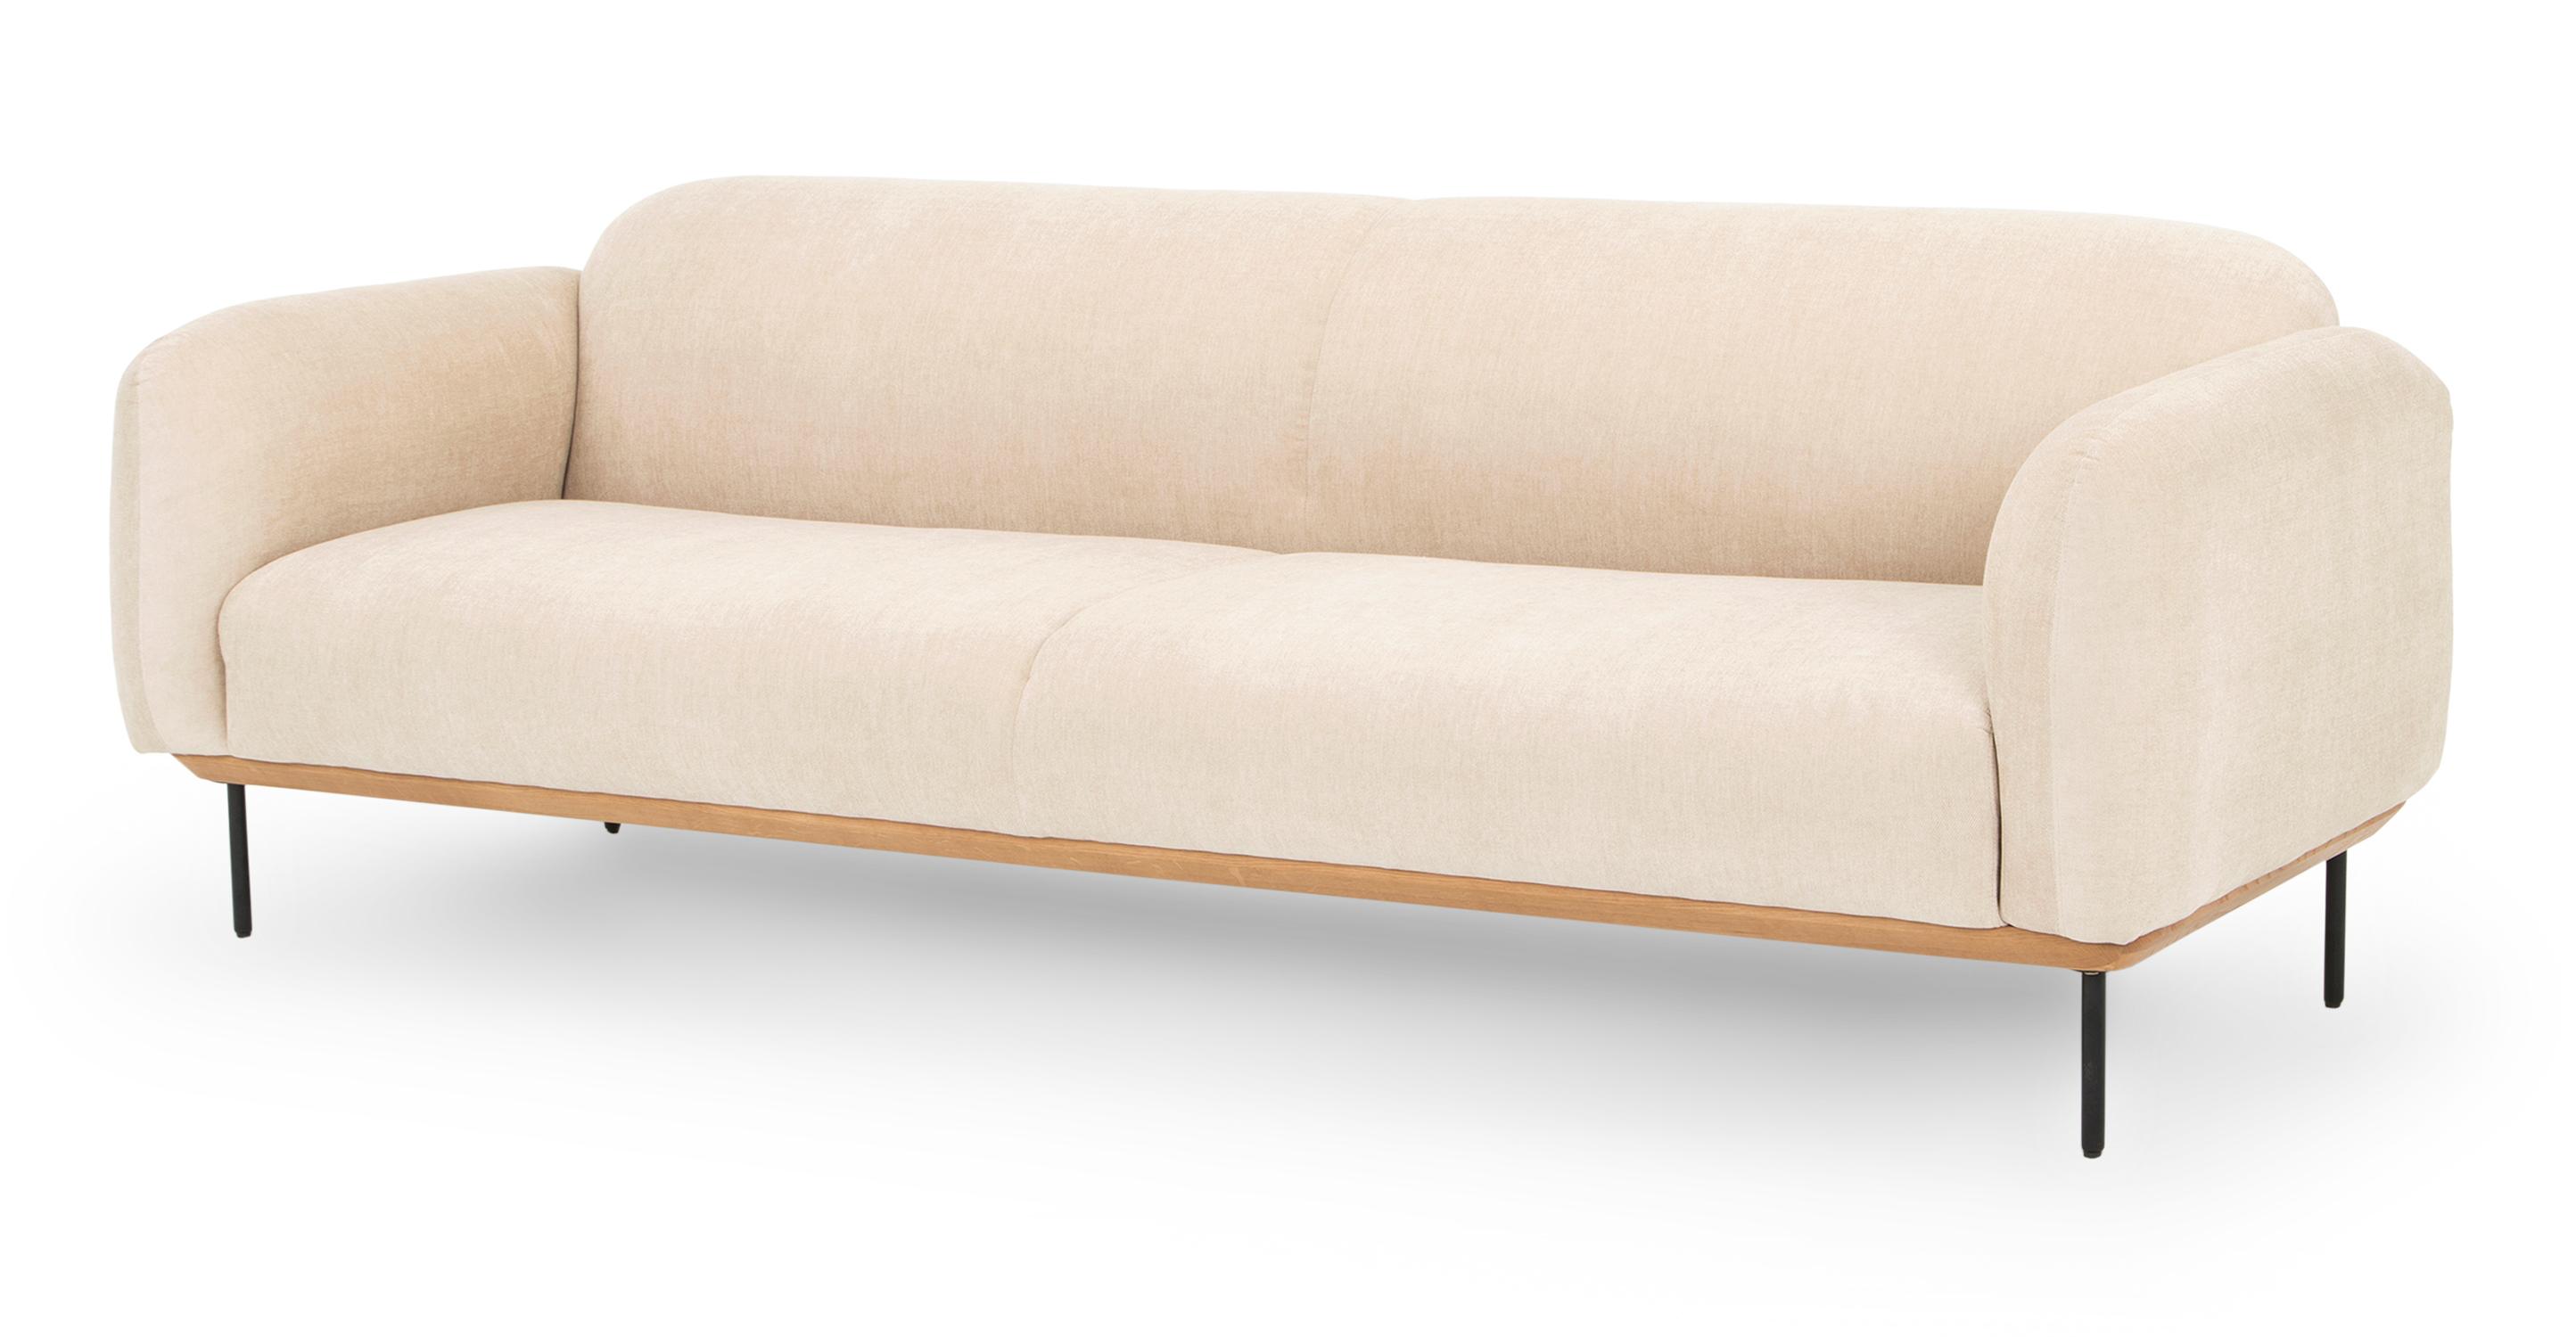 "Cloud 90"" Fabric Sofa, Macadamia"